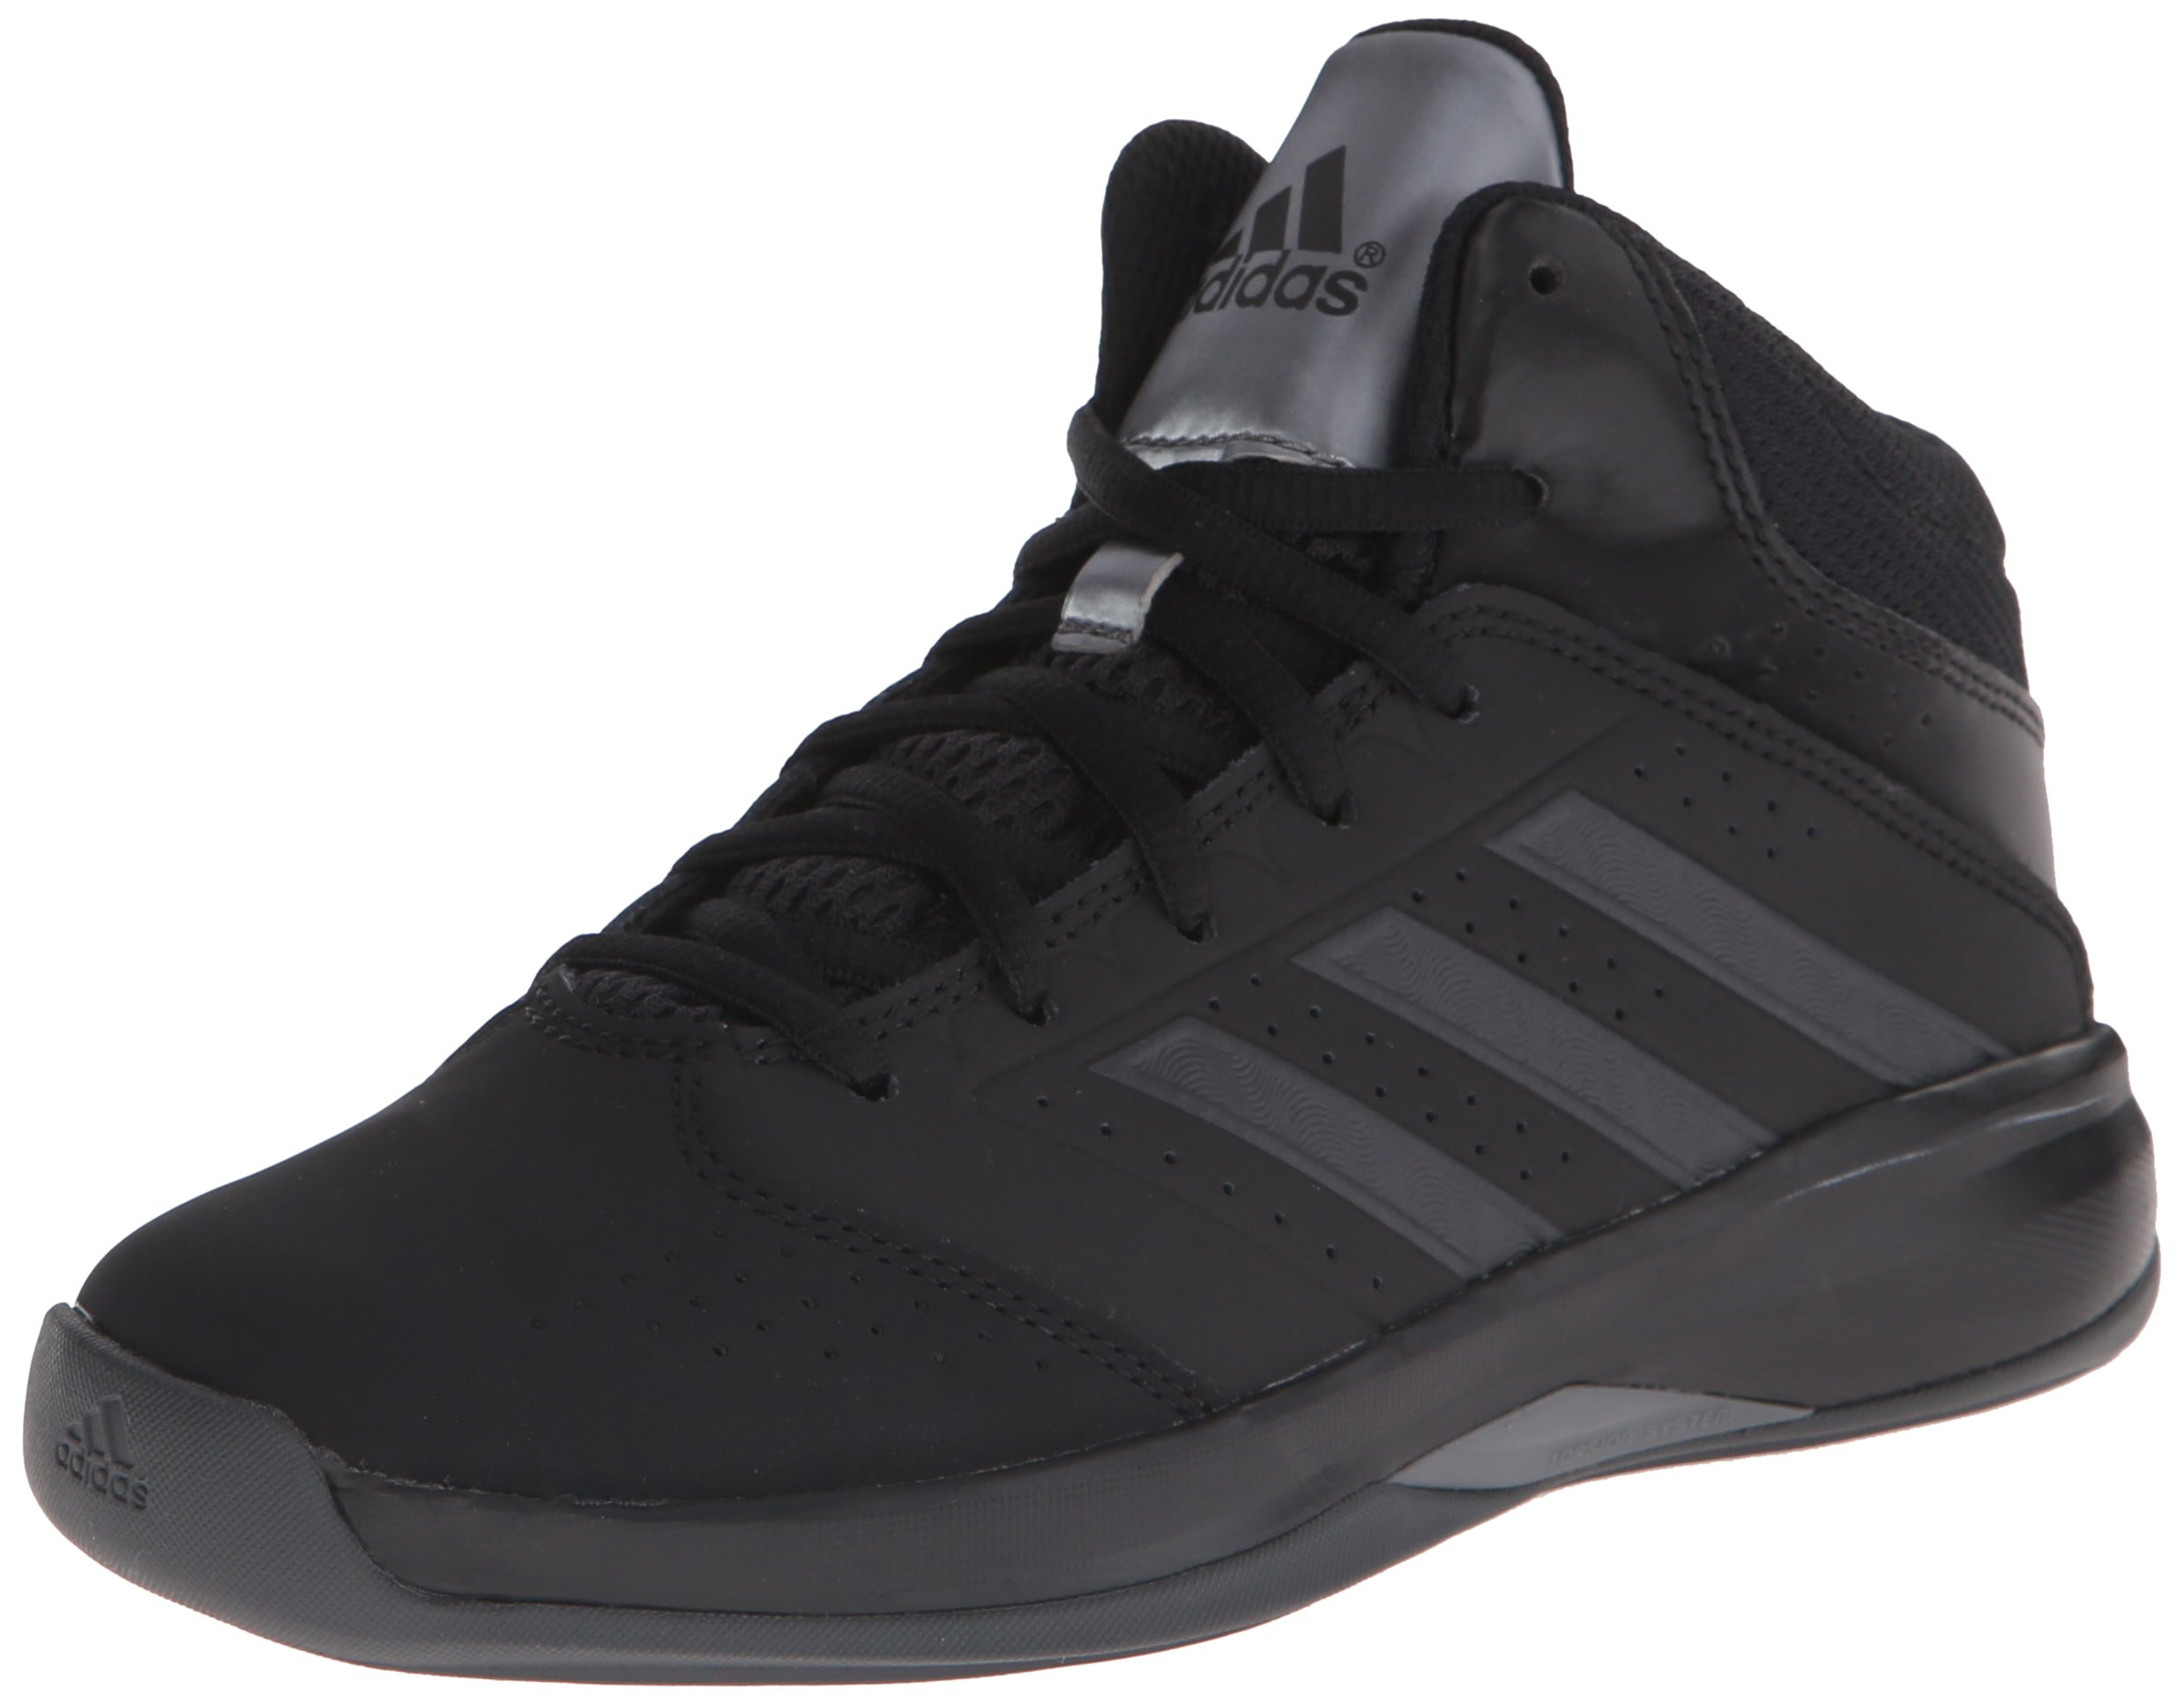 new style 795b3 4d57d Galleon - Adidas Performance Isolation 2 K Basketball Shoe (Little KidBig  Kid),BlackBlackDark Grey,10.5 M US Little Kid